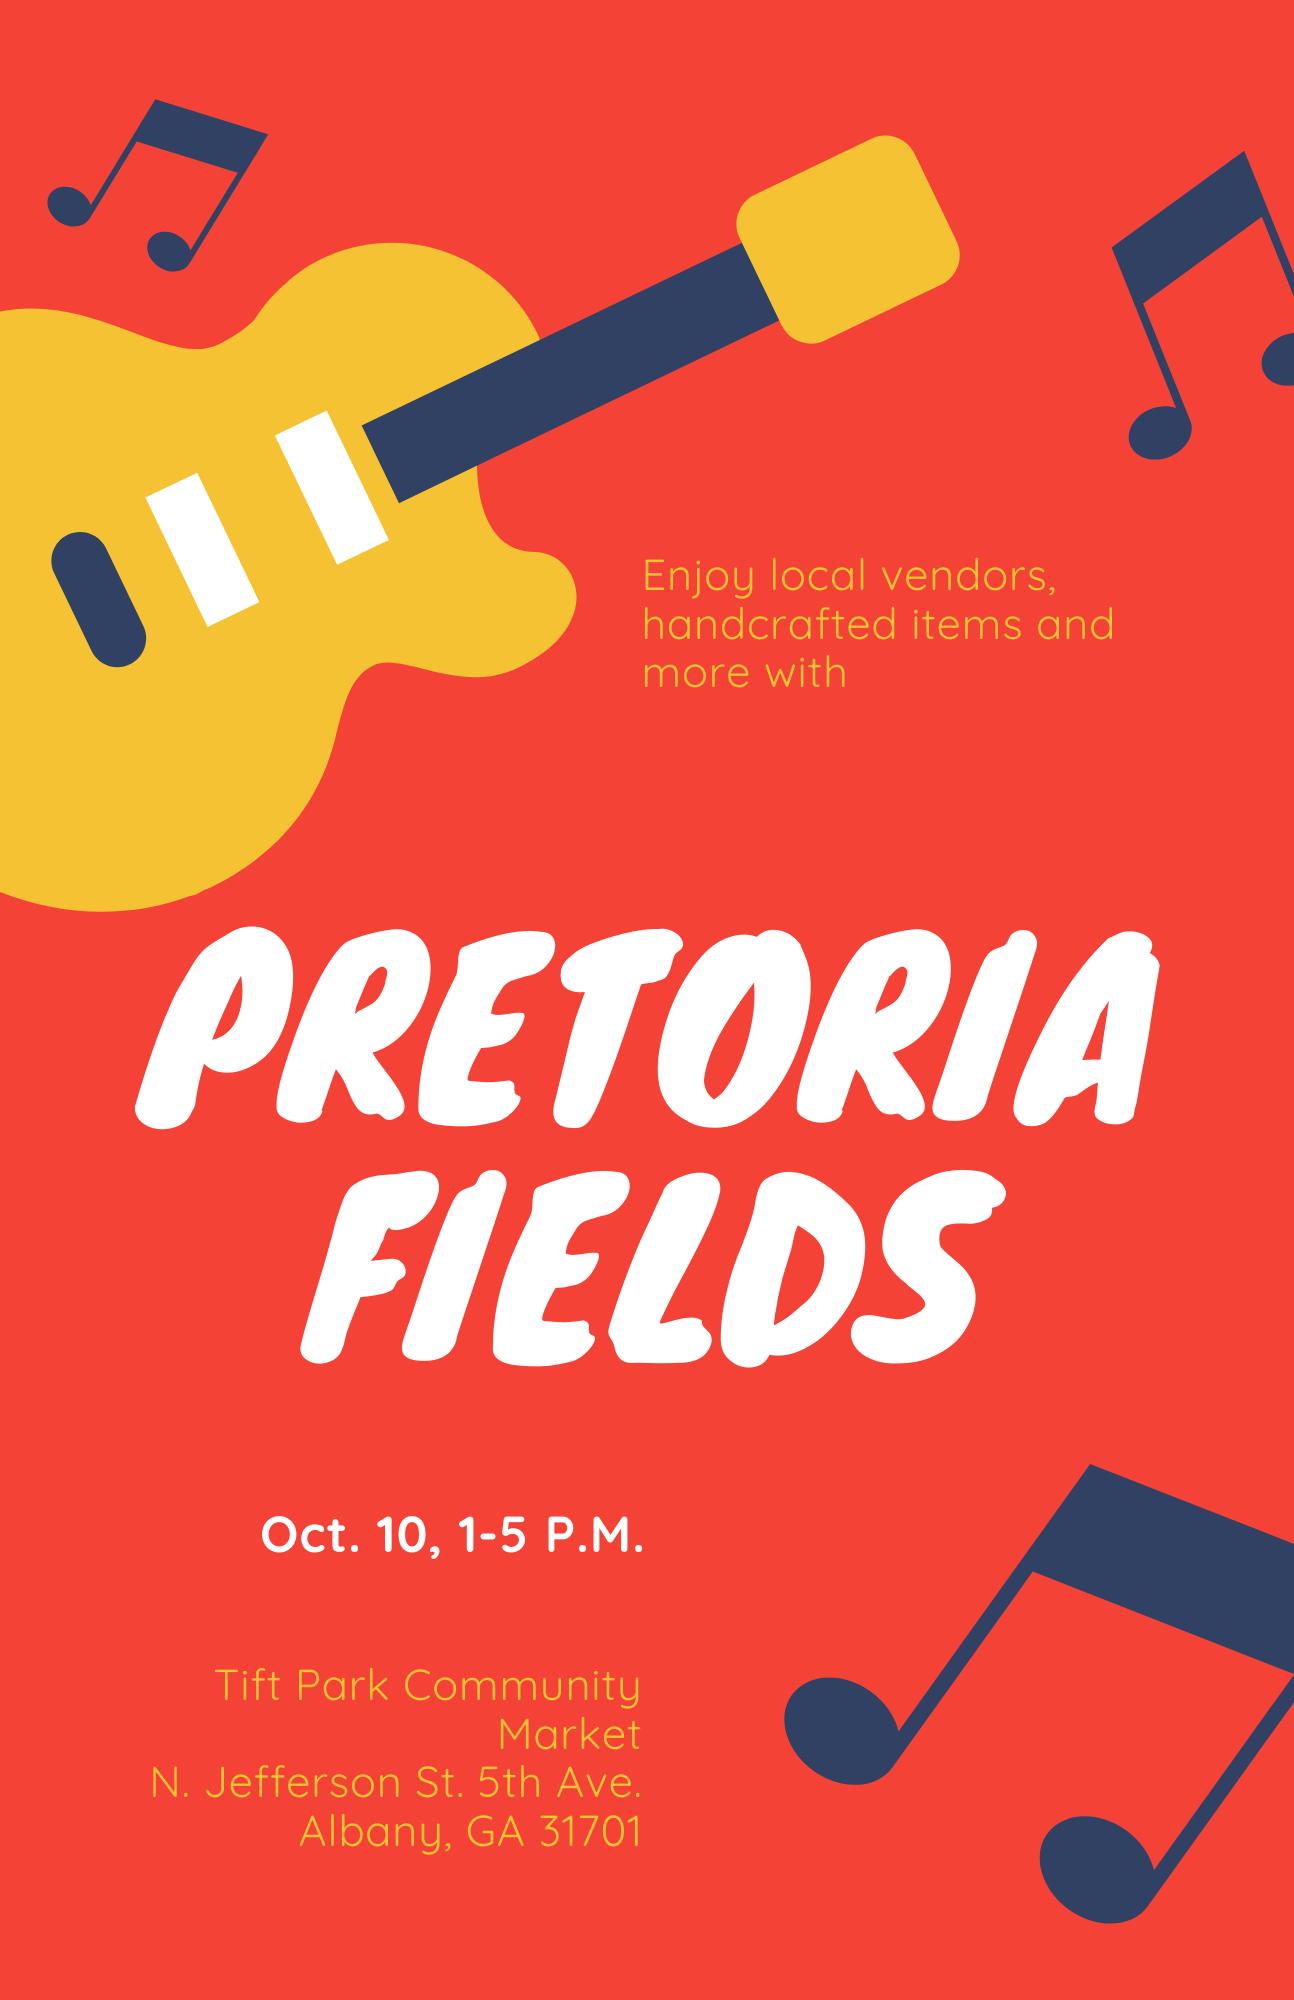 Pretoria Fields at Tift Park Community Market